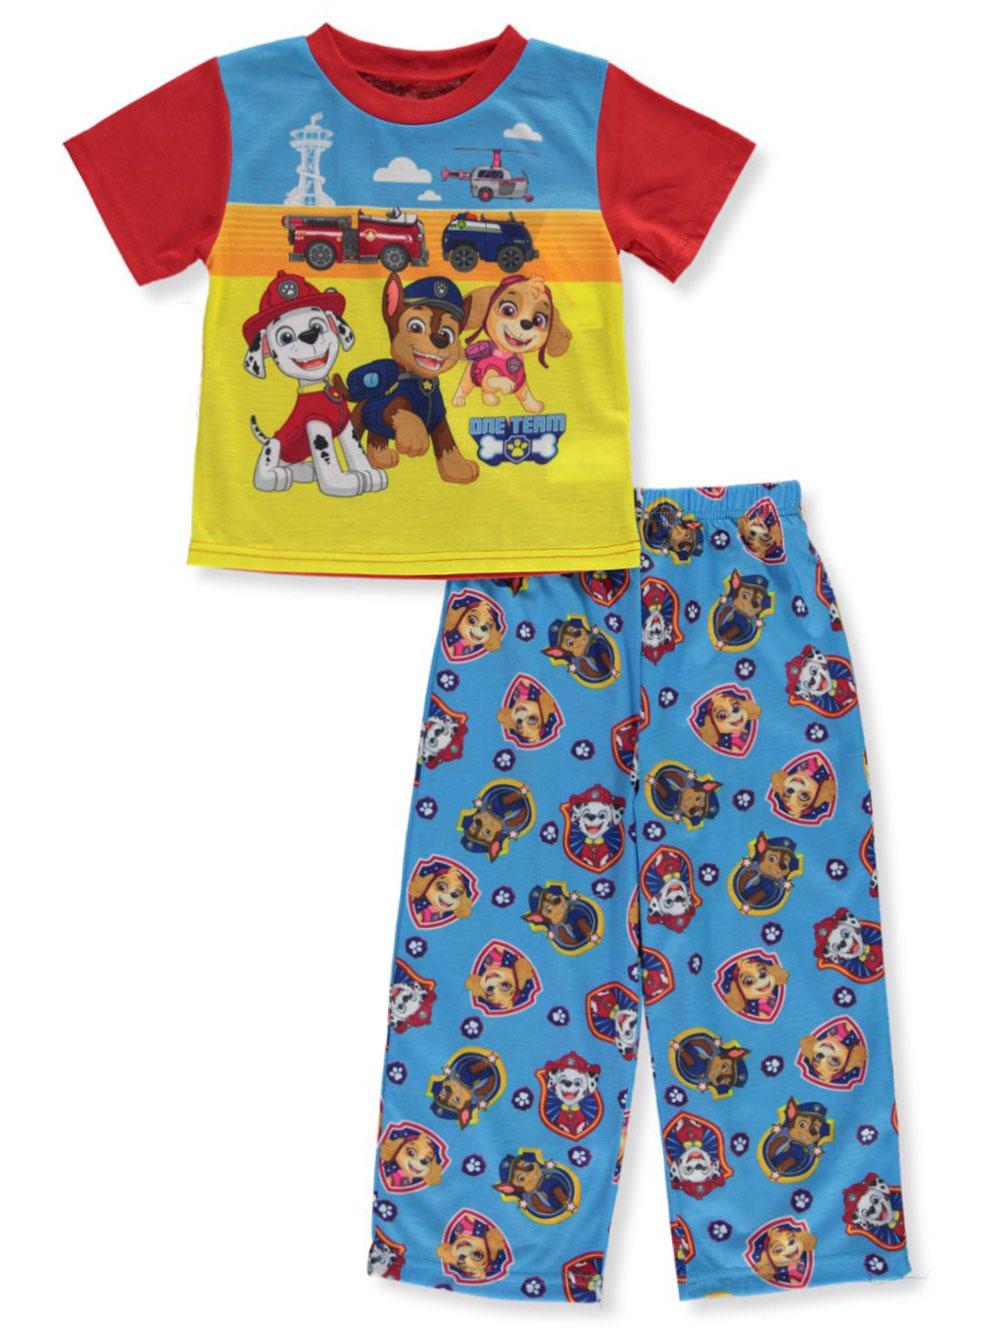 Boys Blue Paw Patrol Chase All In One Pyjamas PJs Kids Childrens Nightwear